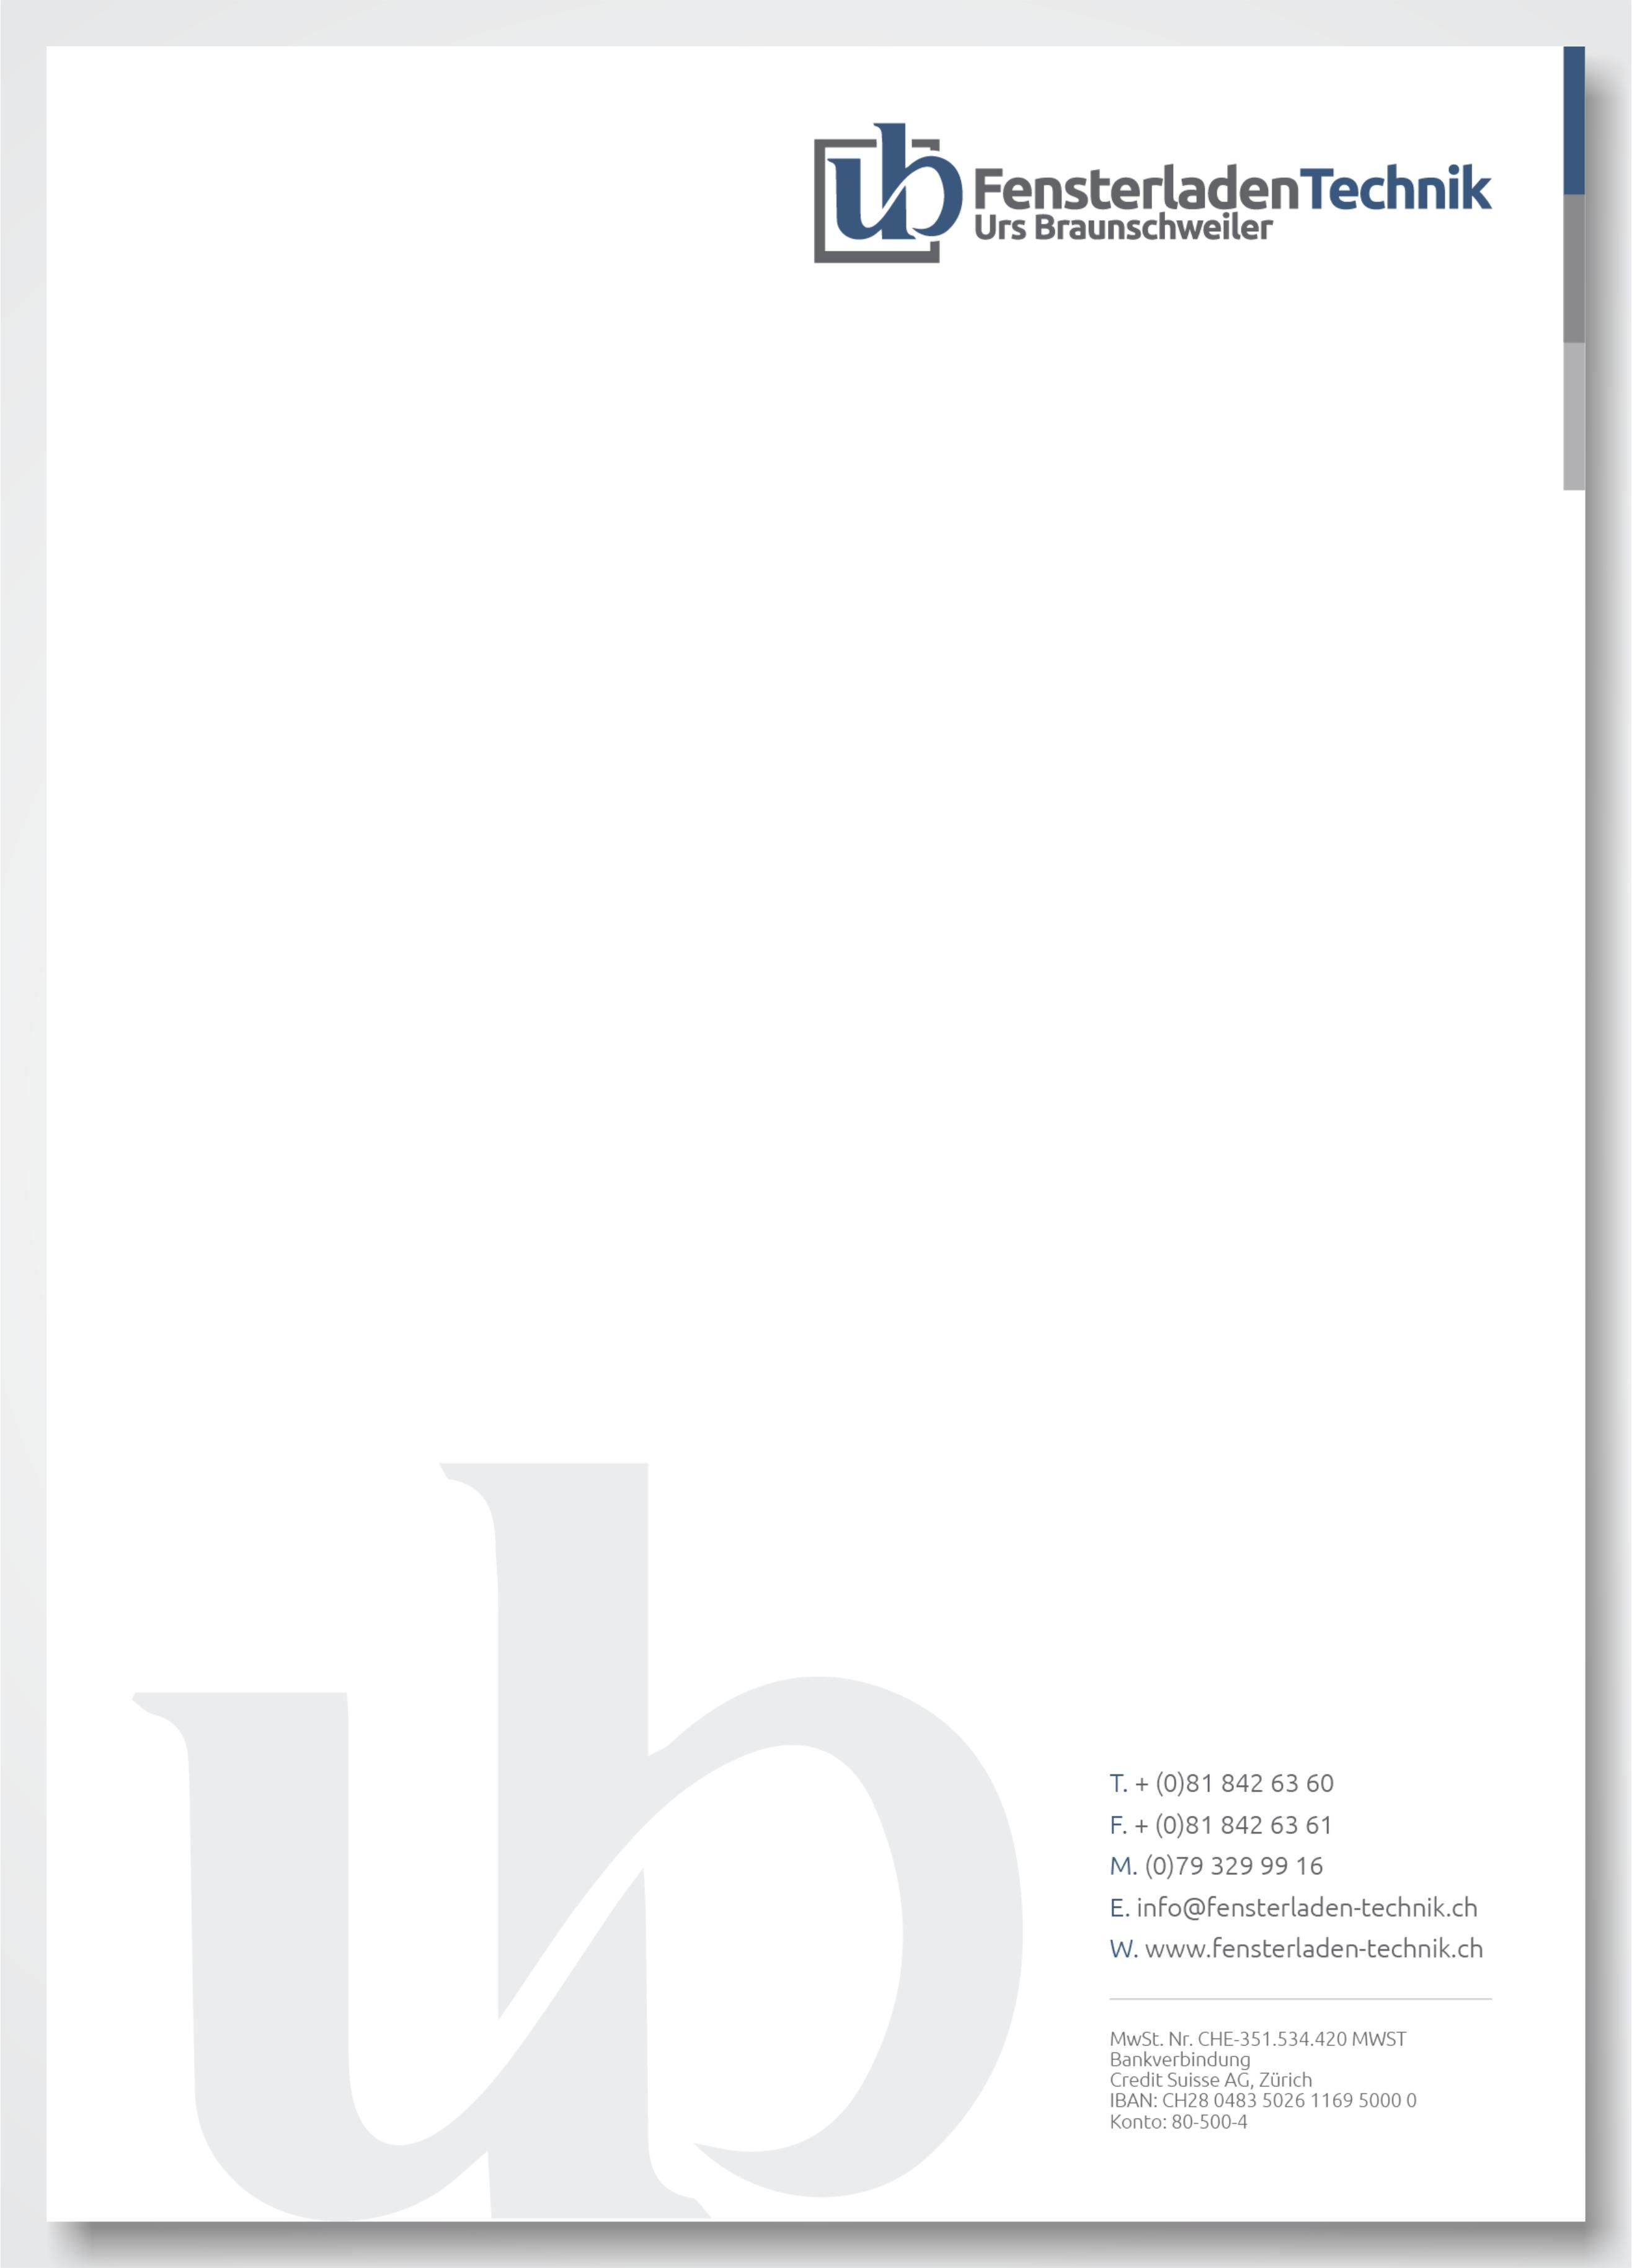 fensterladen technik stationery design